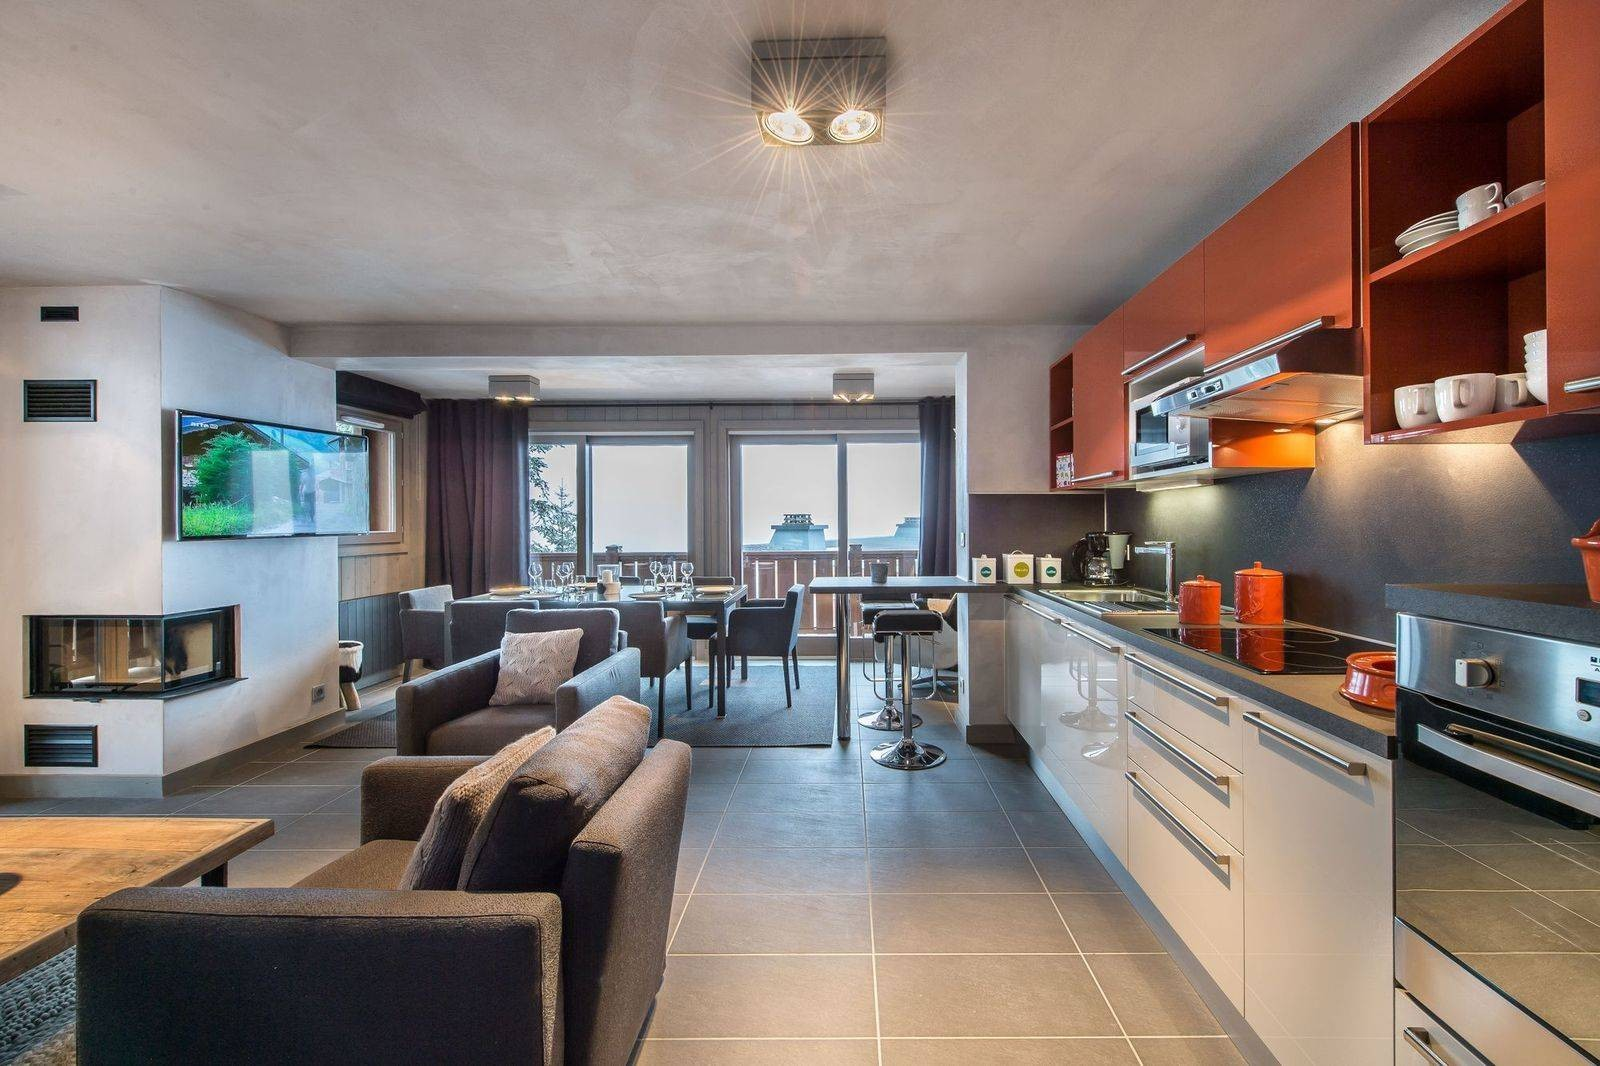 Courchevel 1650 Location Appartement Luxe Simeline Cuisine